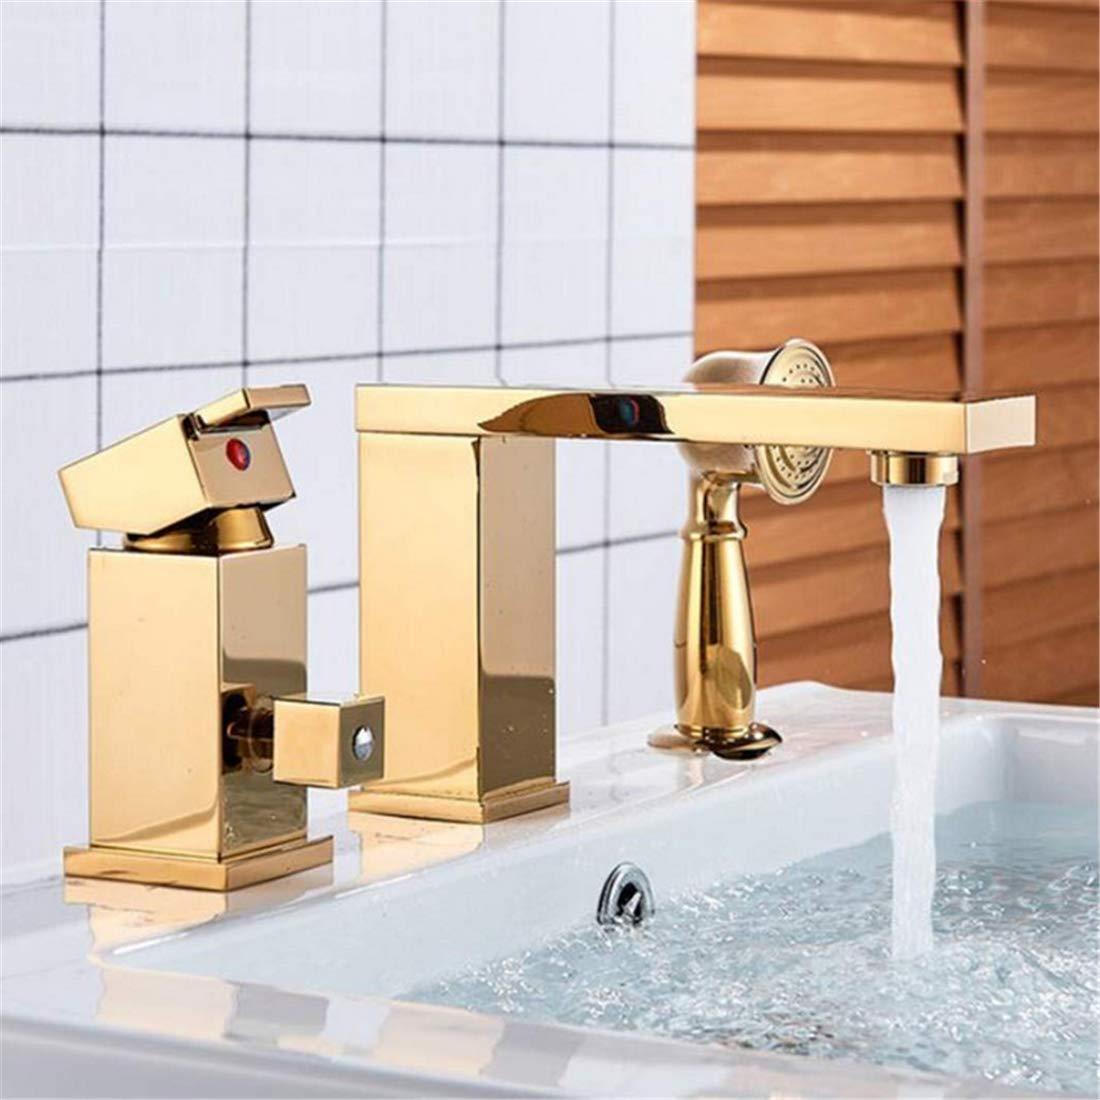 Retro Faucetwashbasin Mixer Solid Brass golden Chrome 4 color Polish 3Pcs Bathroom Faucet